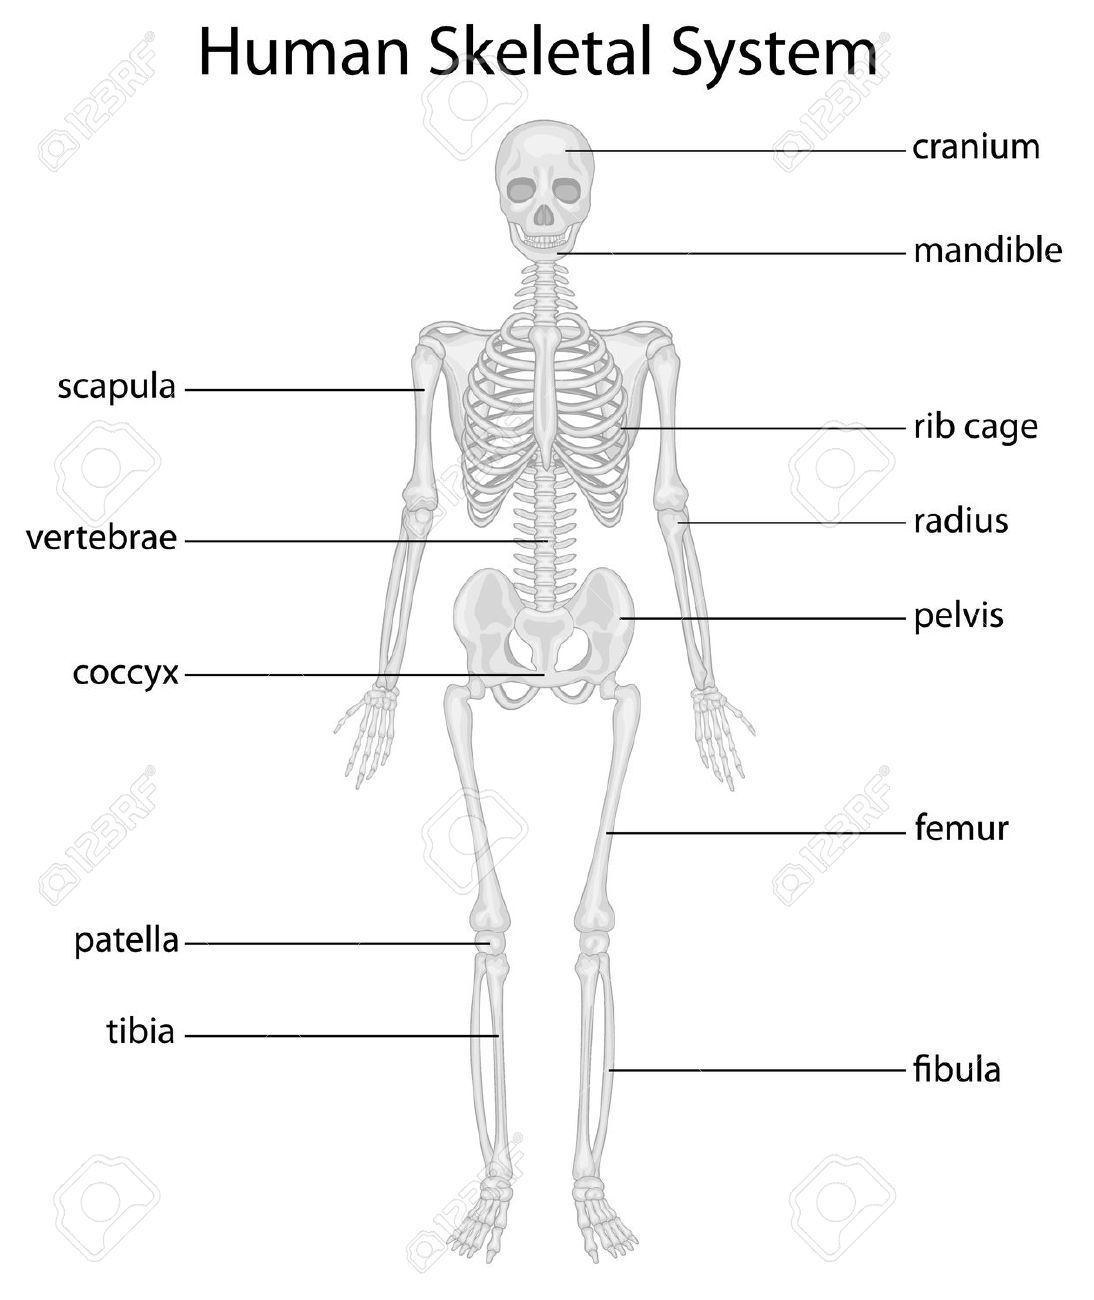 body skeleton diagram without labels skeletal system diagram without labels label long bone diagram [ 1094 x 1300 Pixel ]